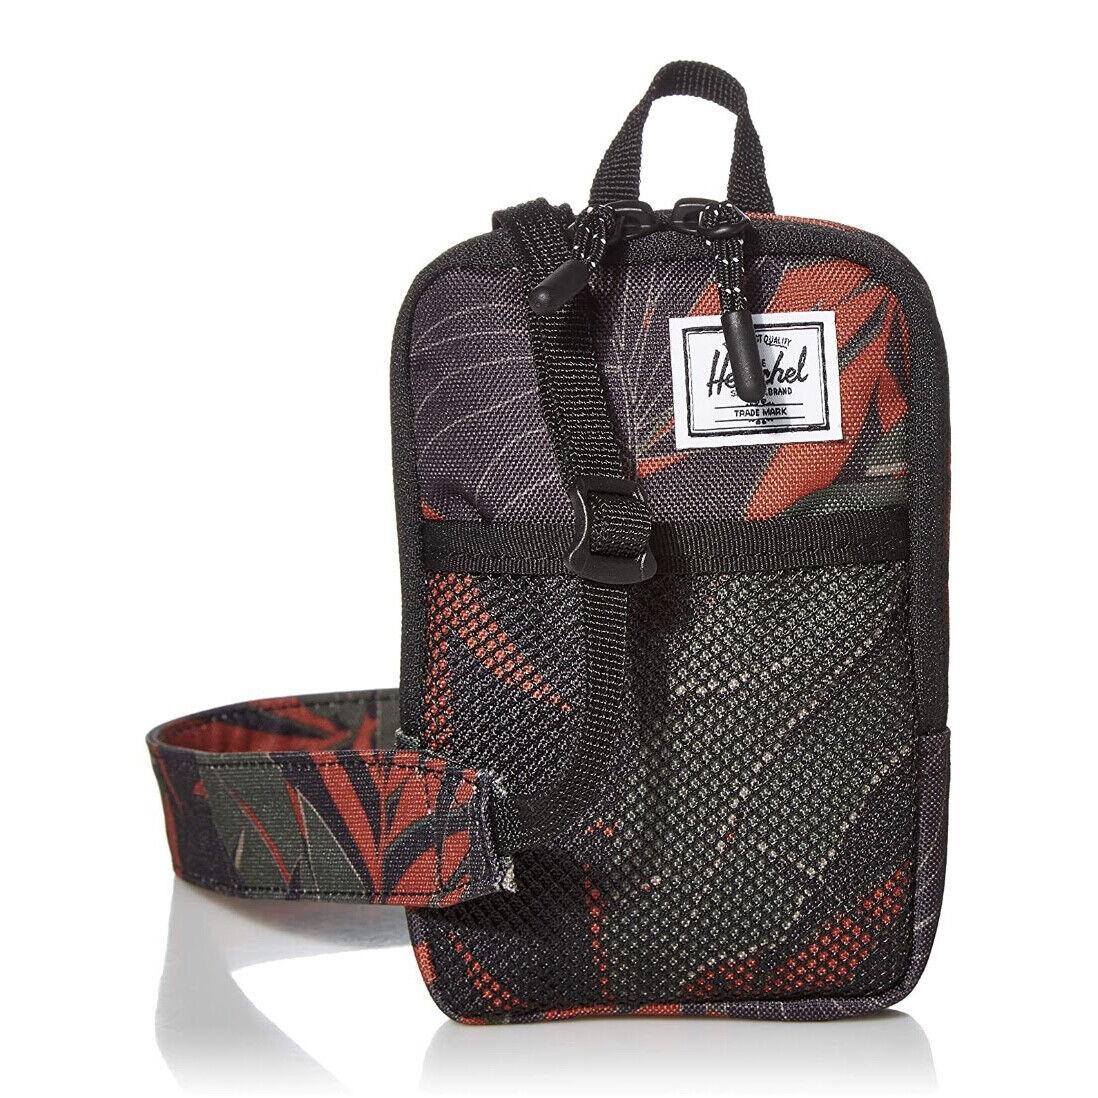 Herschel Sinclair Small Cross Body Bag, Dark Olive Palm, One